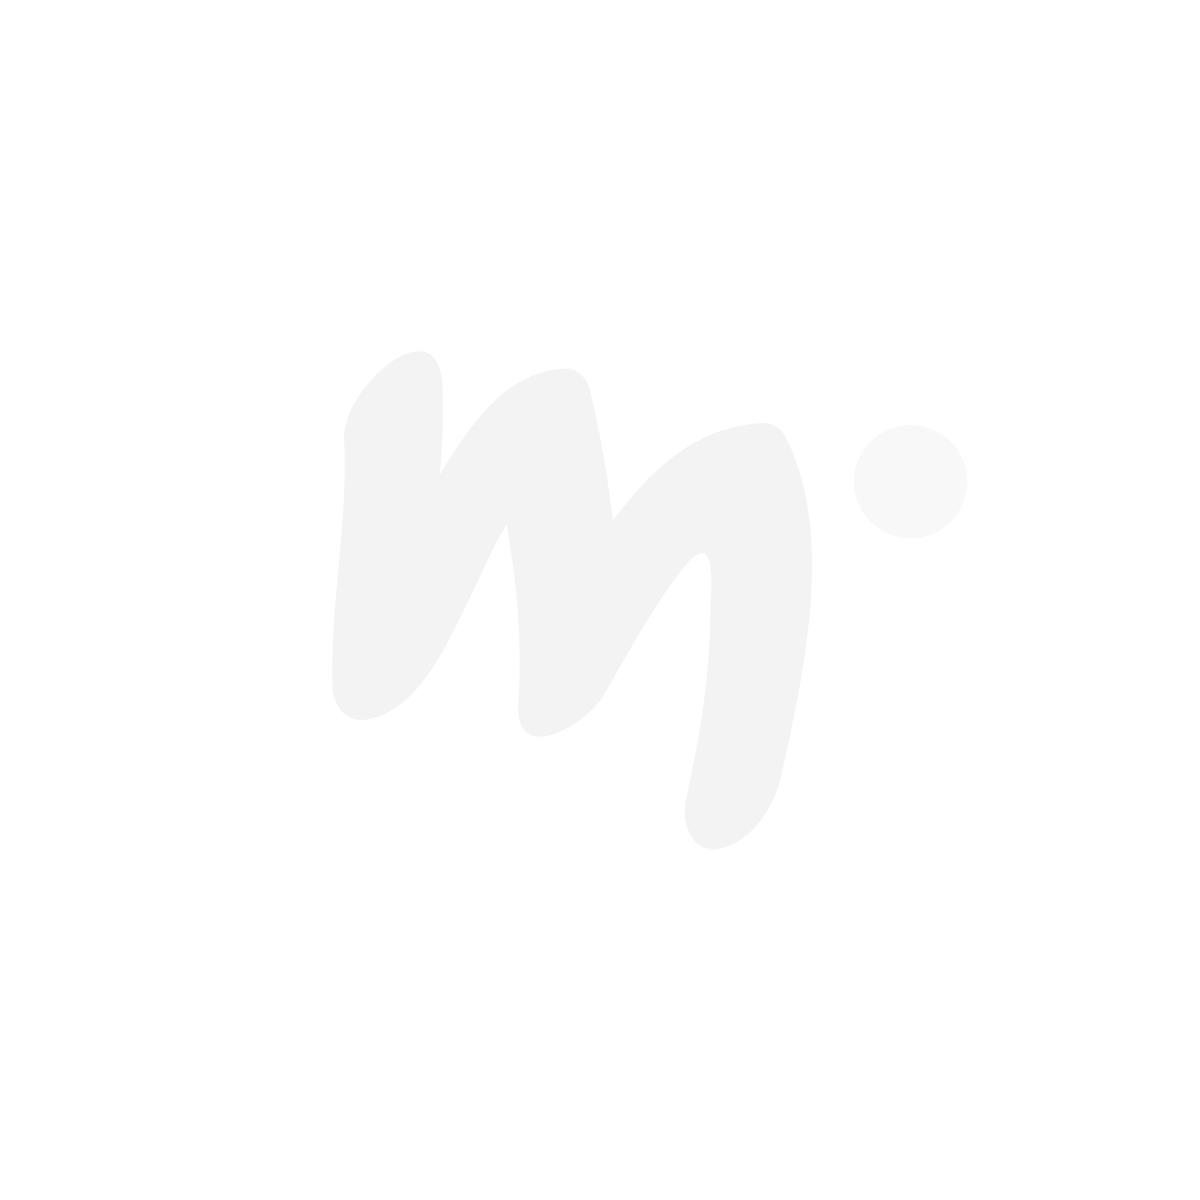 Moomin Vinssi+ Pouch Adventure